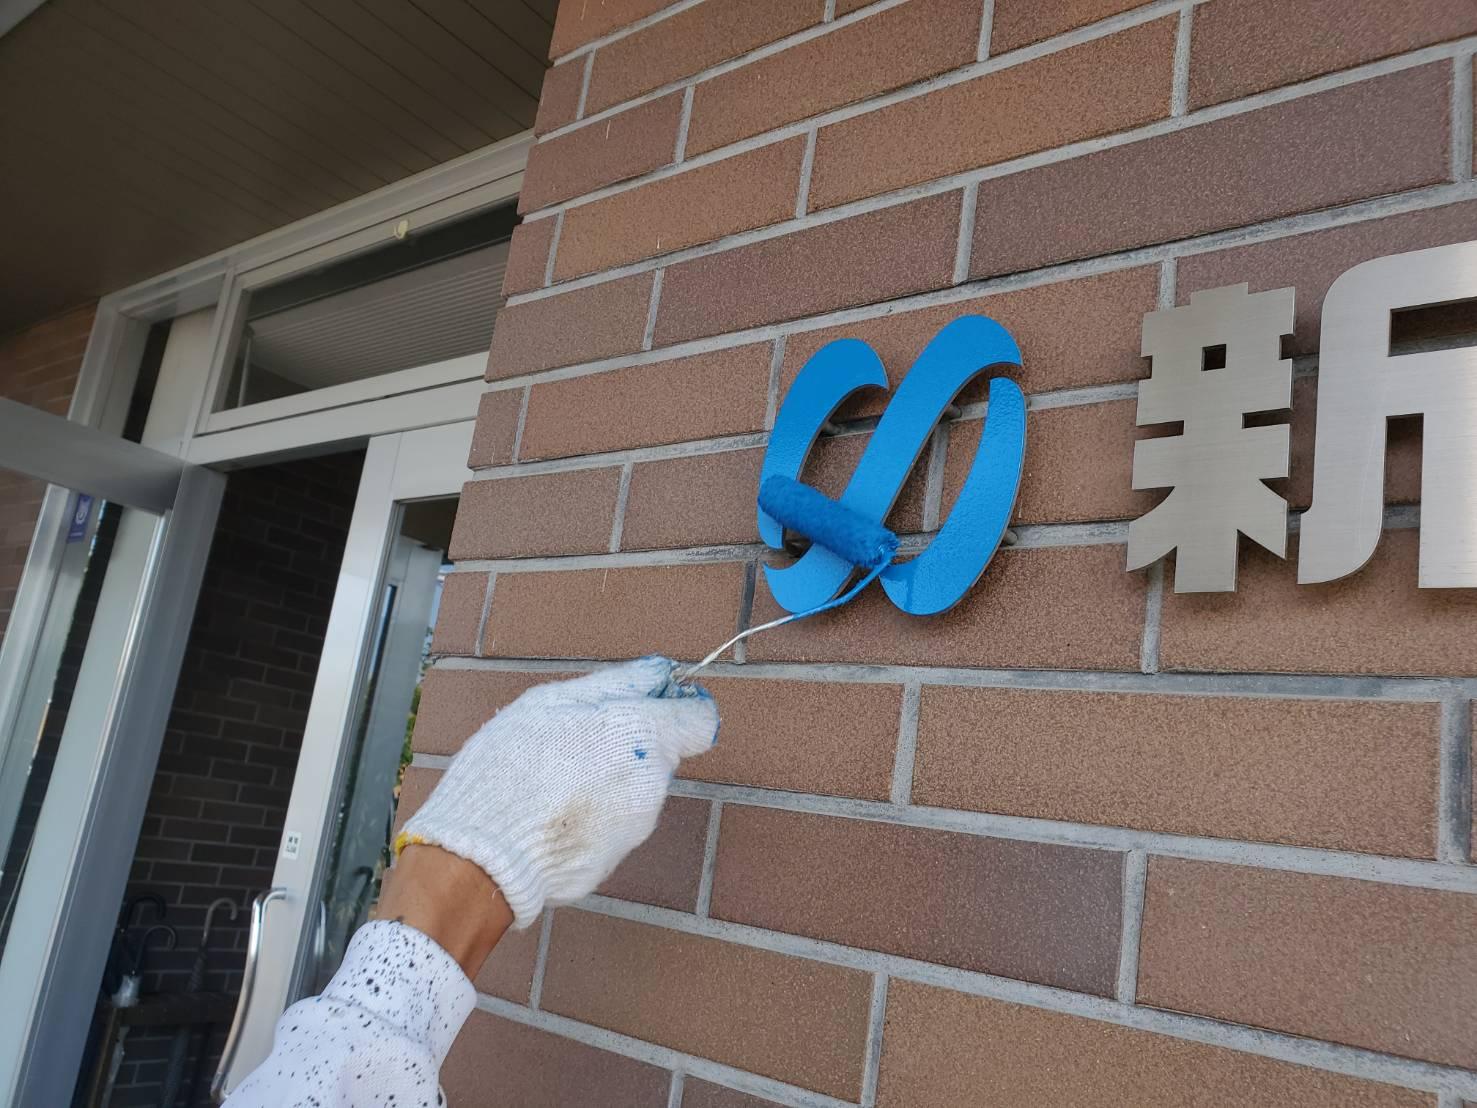 佐賀市 外壁塗装 ひろし 施工事例 施工日記 板金部塗装